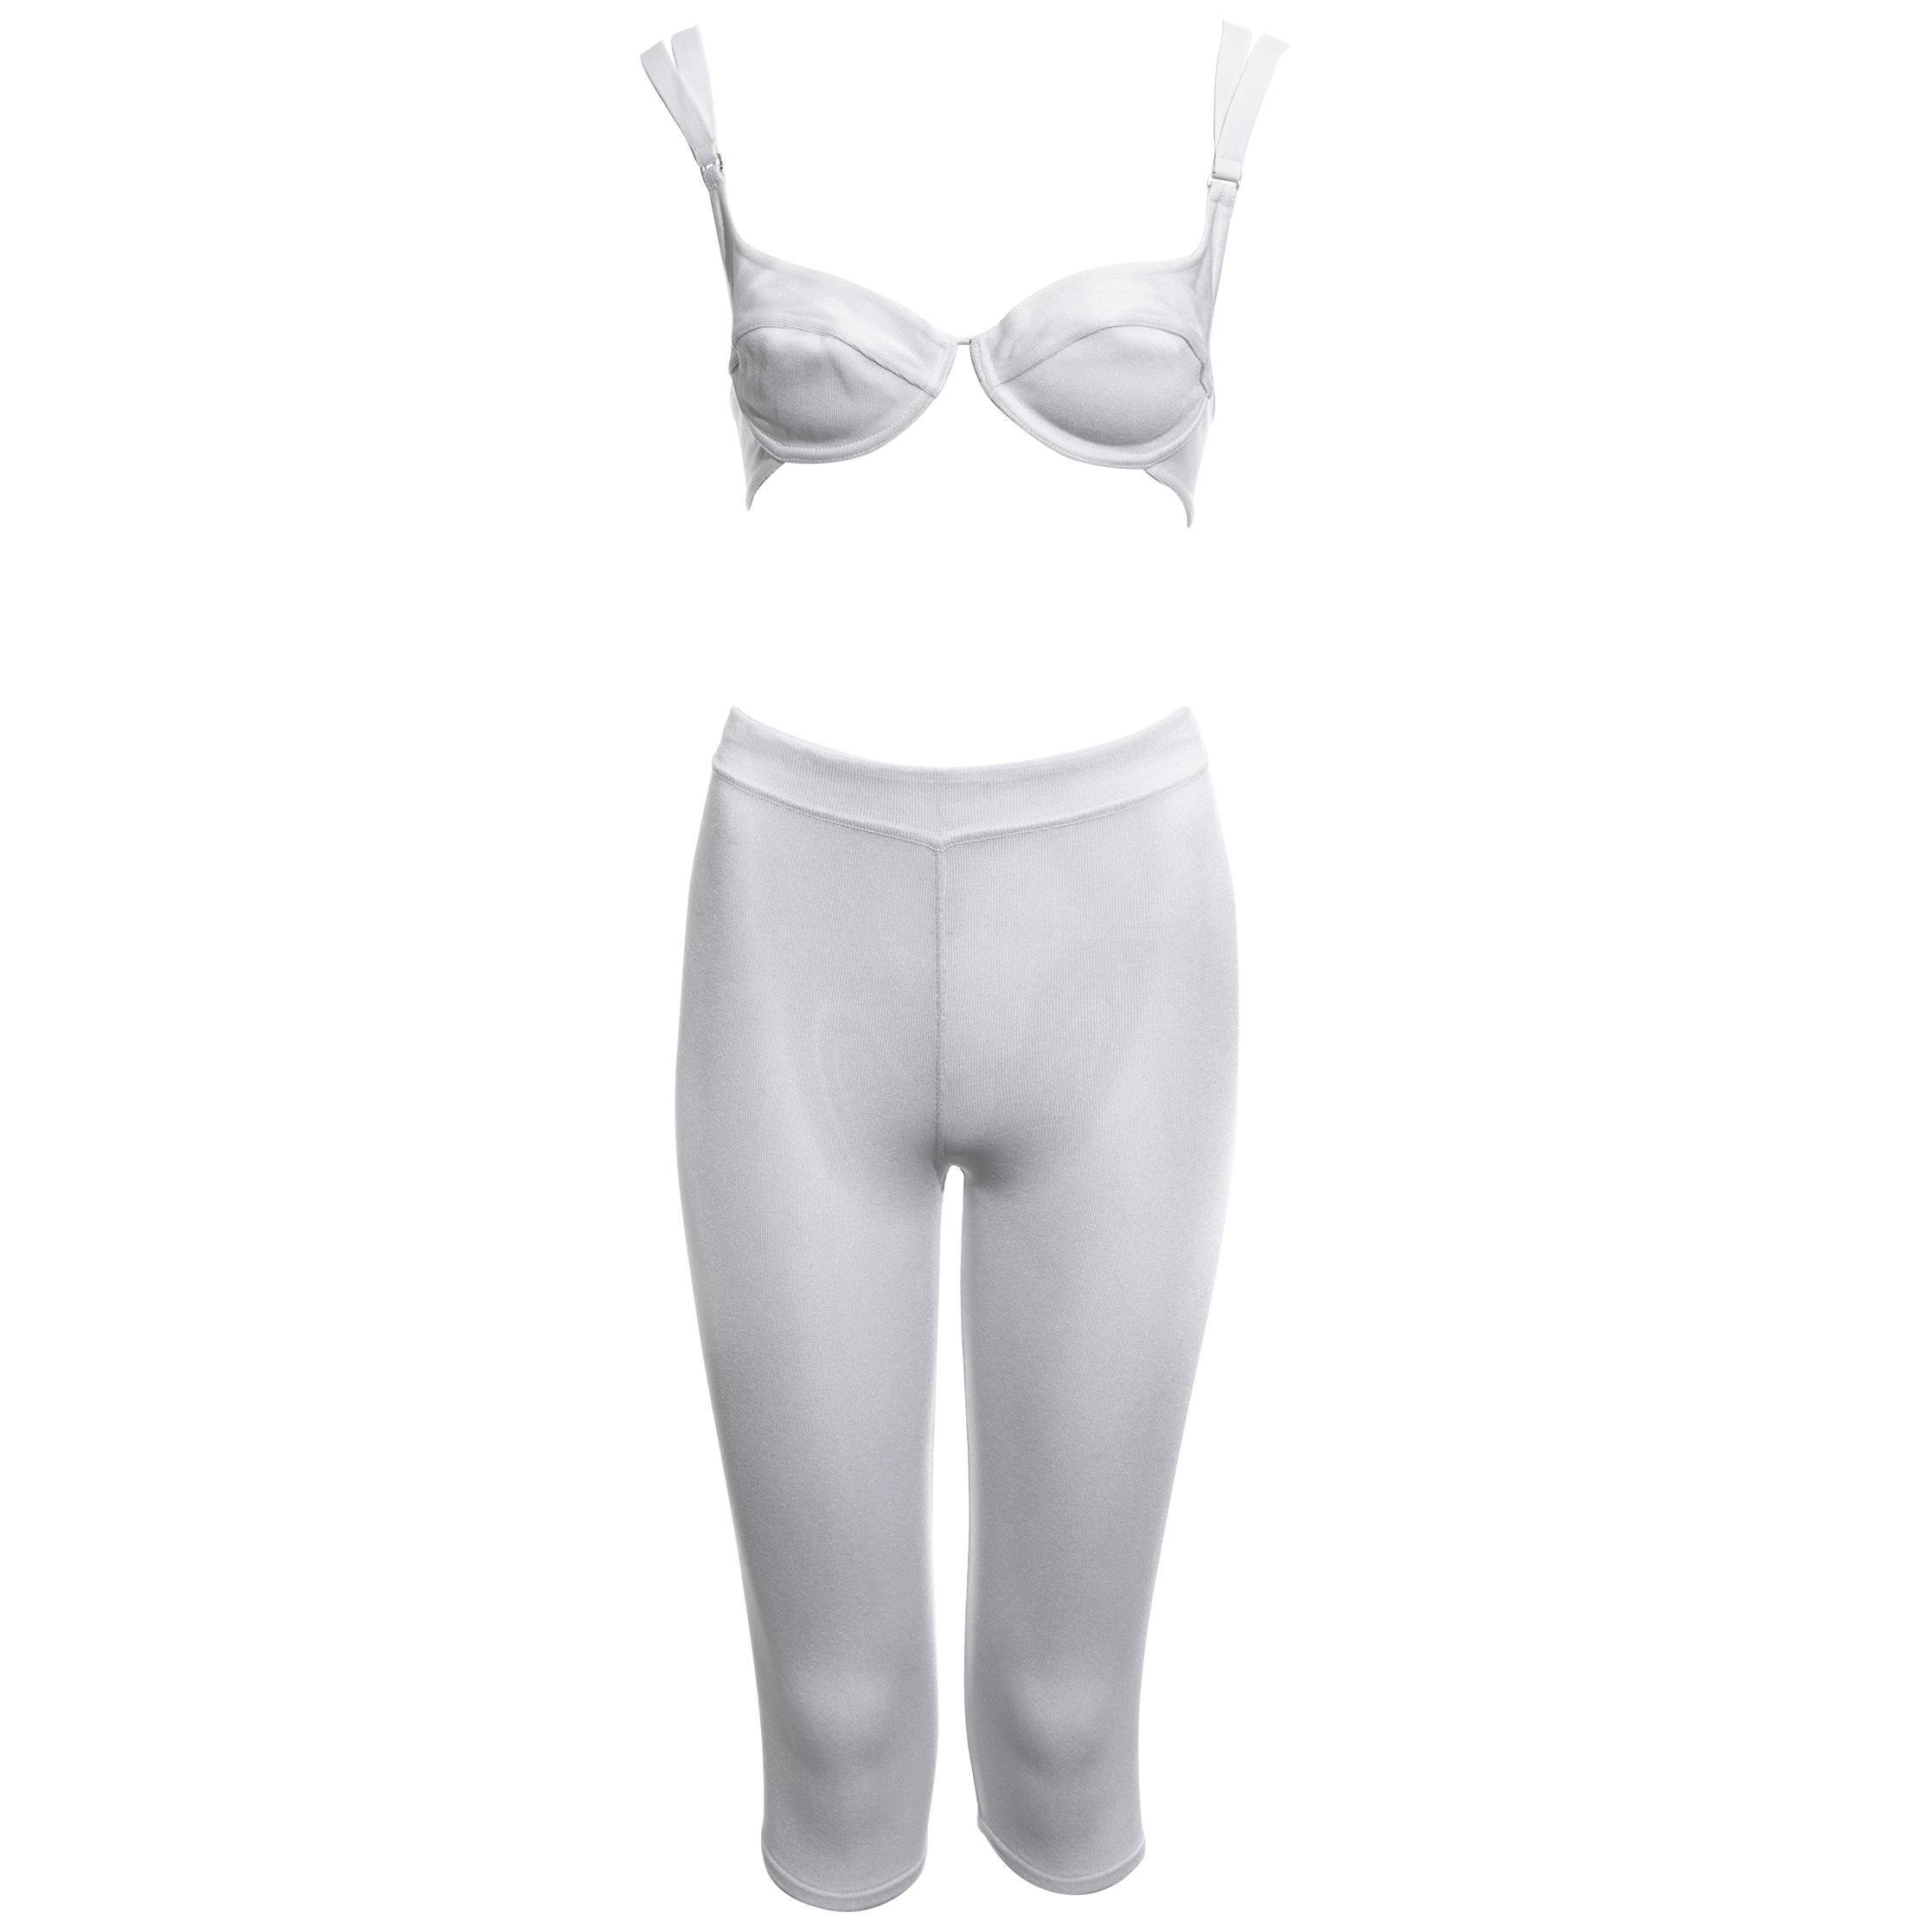 Azzedine Alaia white rayon spandex bra and cycling shorts set, ss 1990